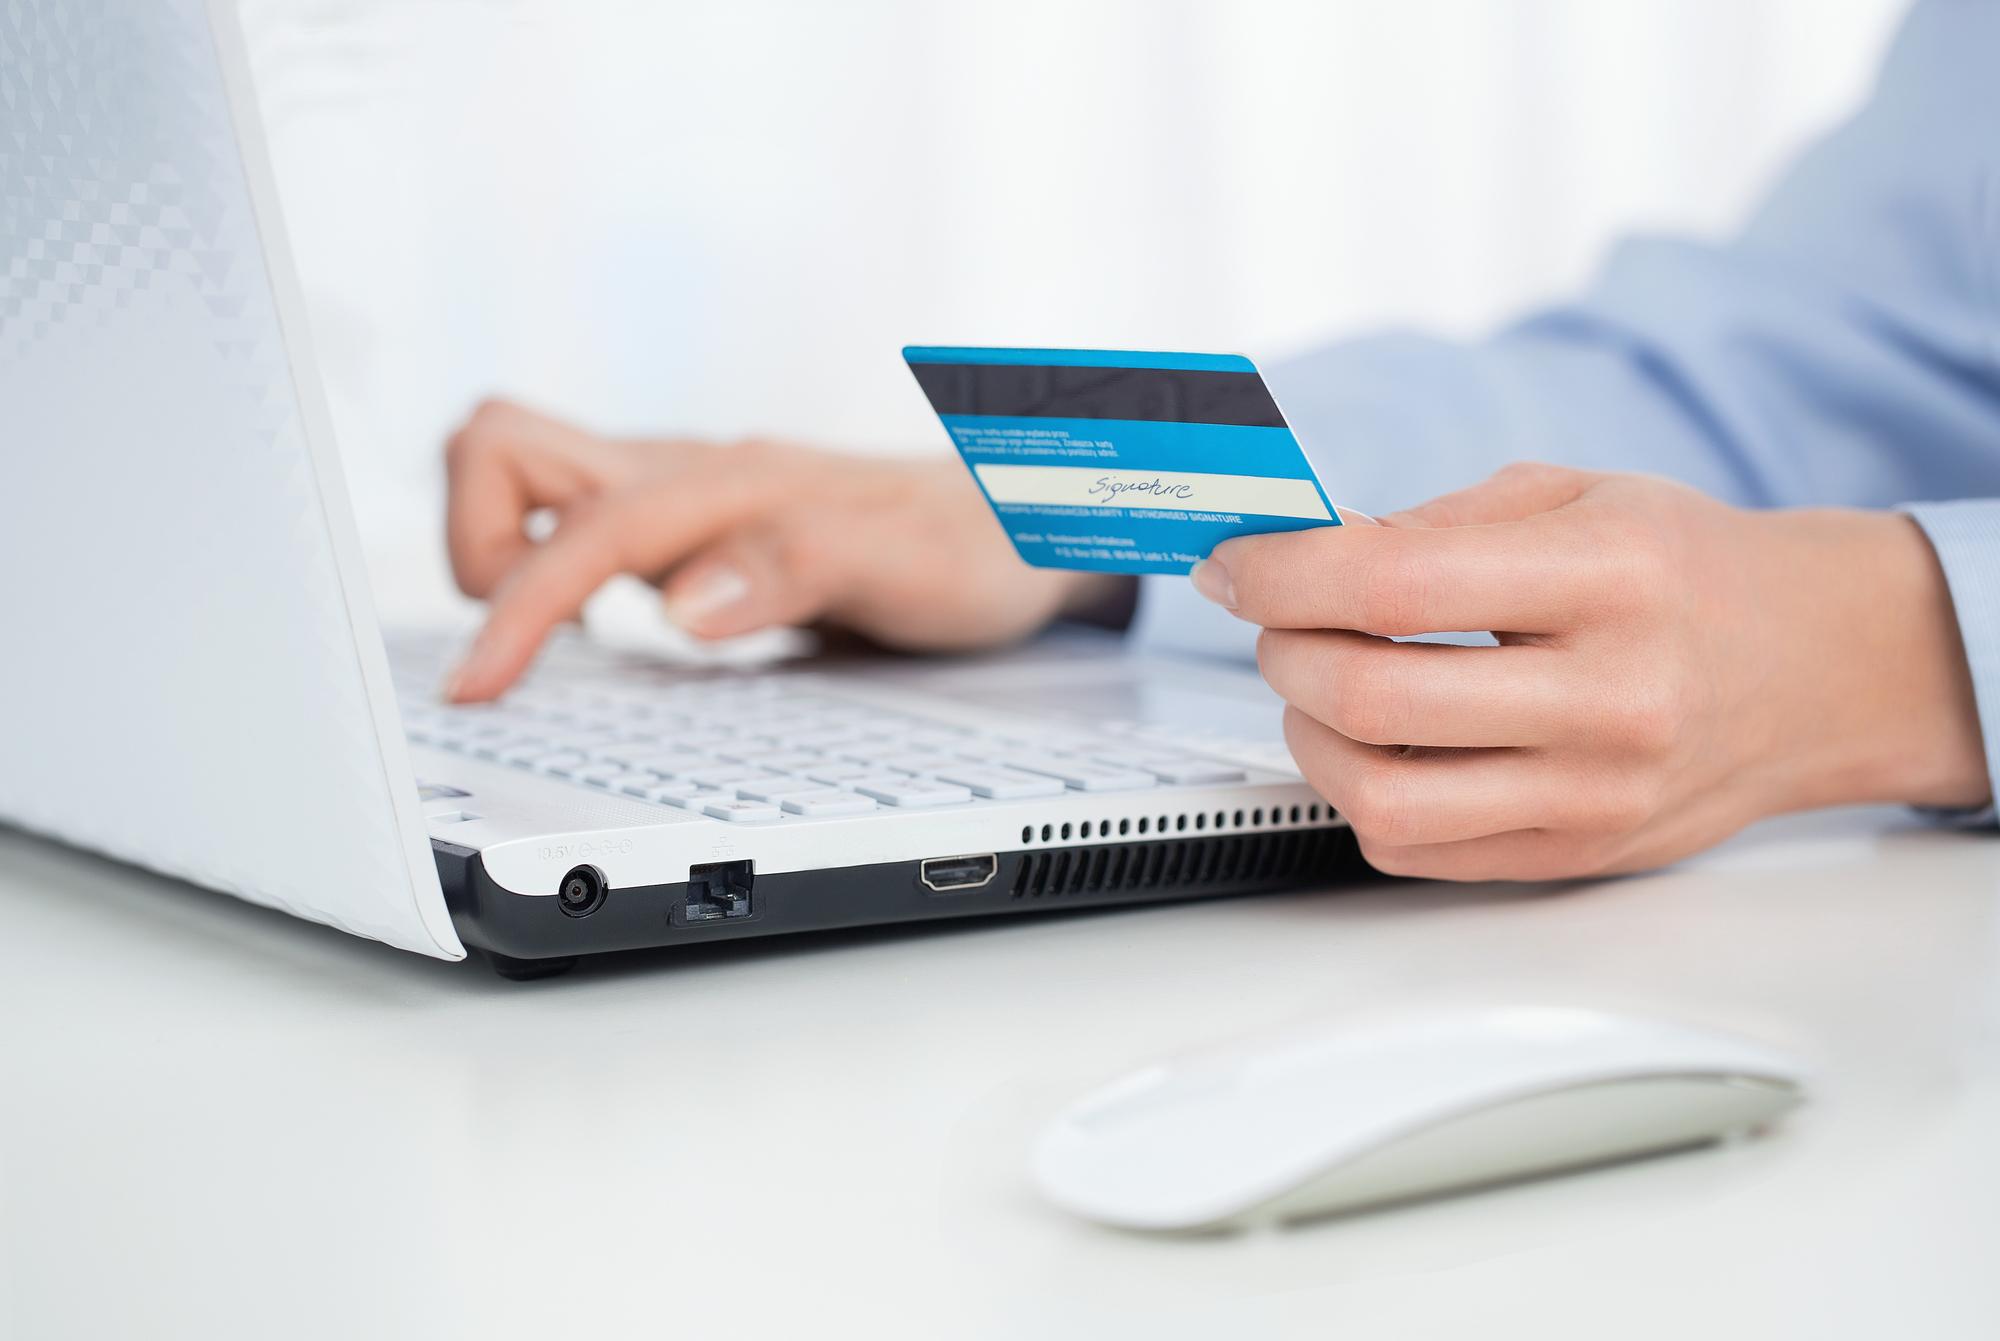 Можно ли по дебетовой карте взять кредит кредит под залог доски